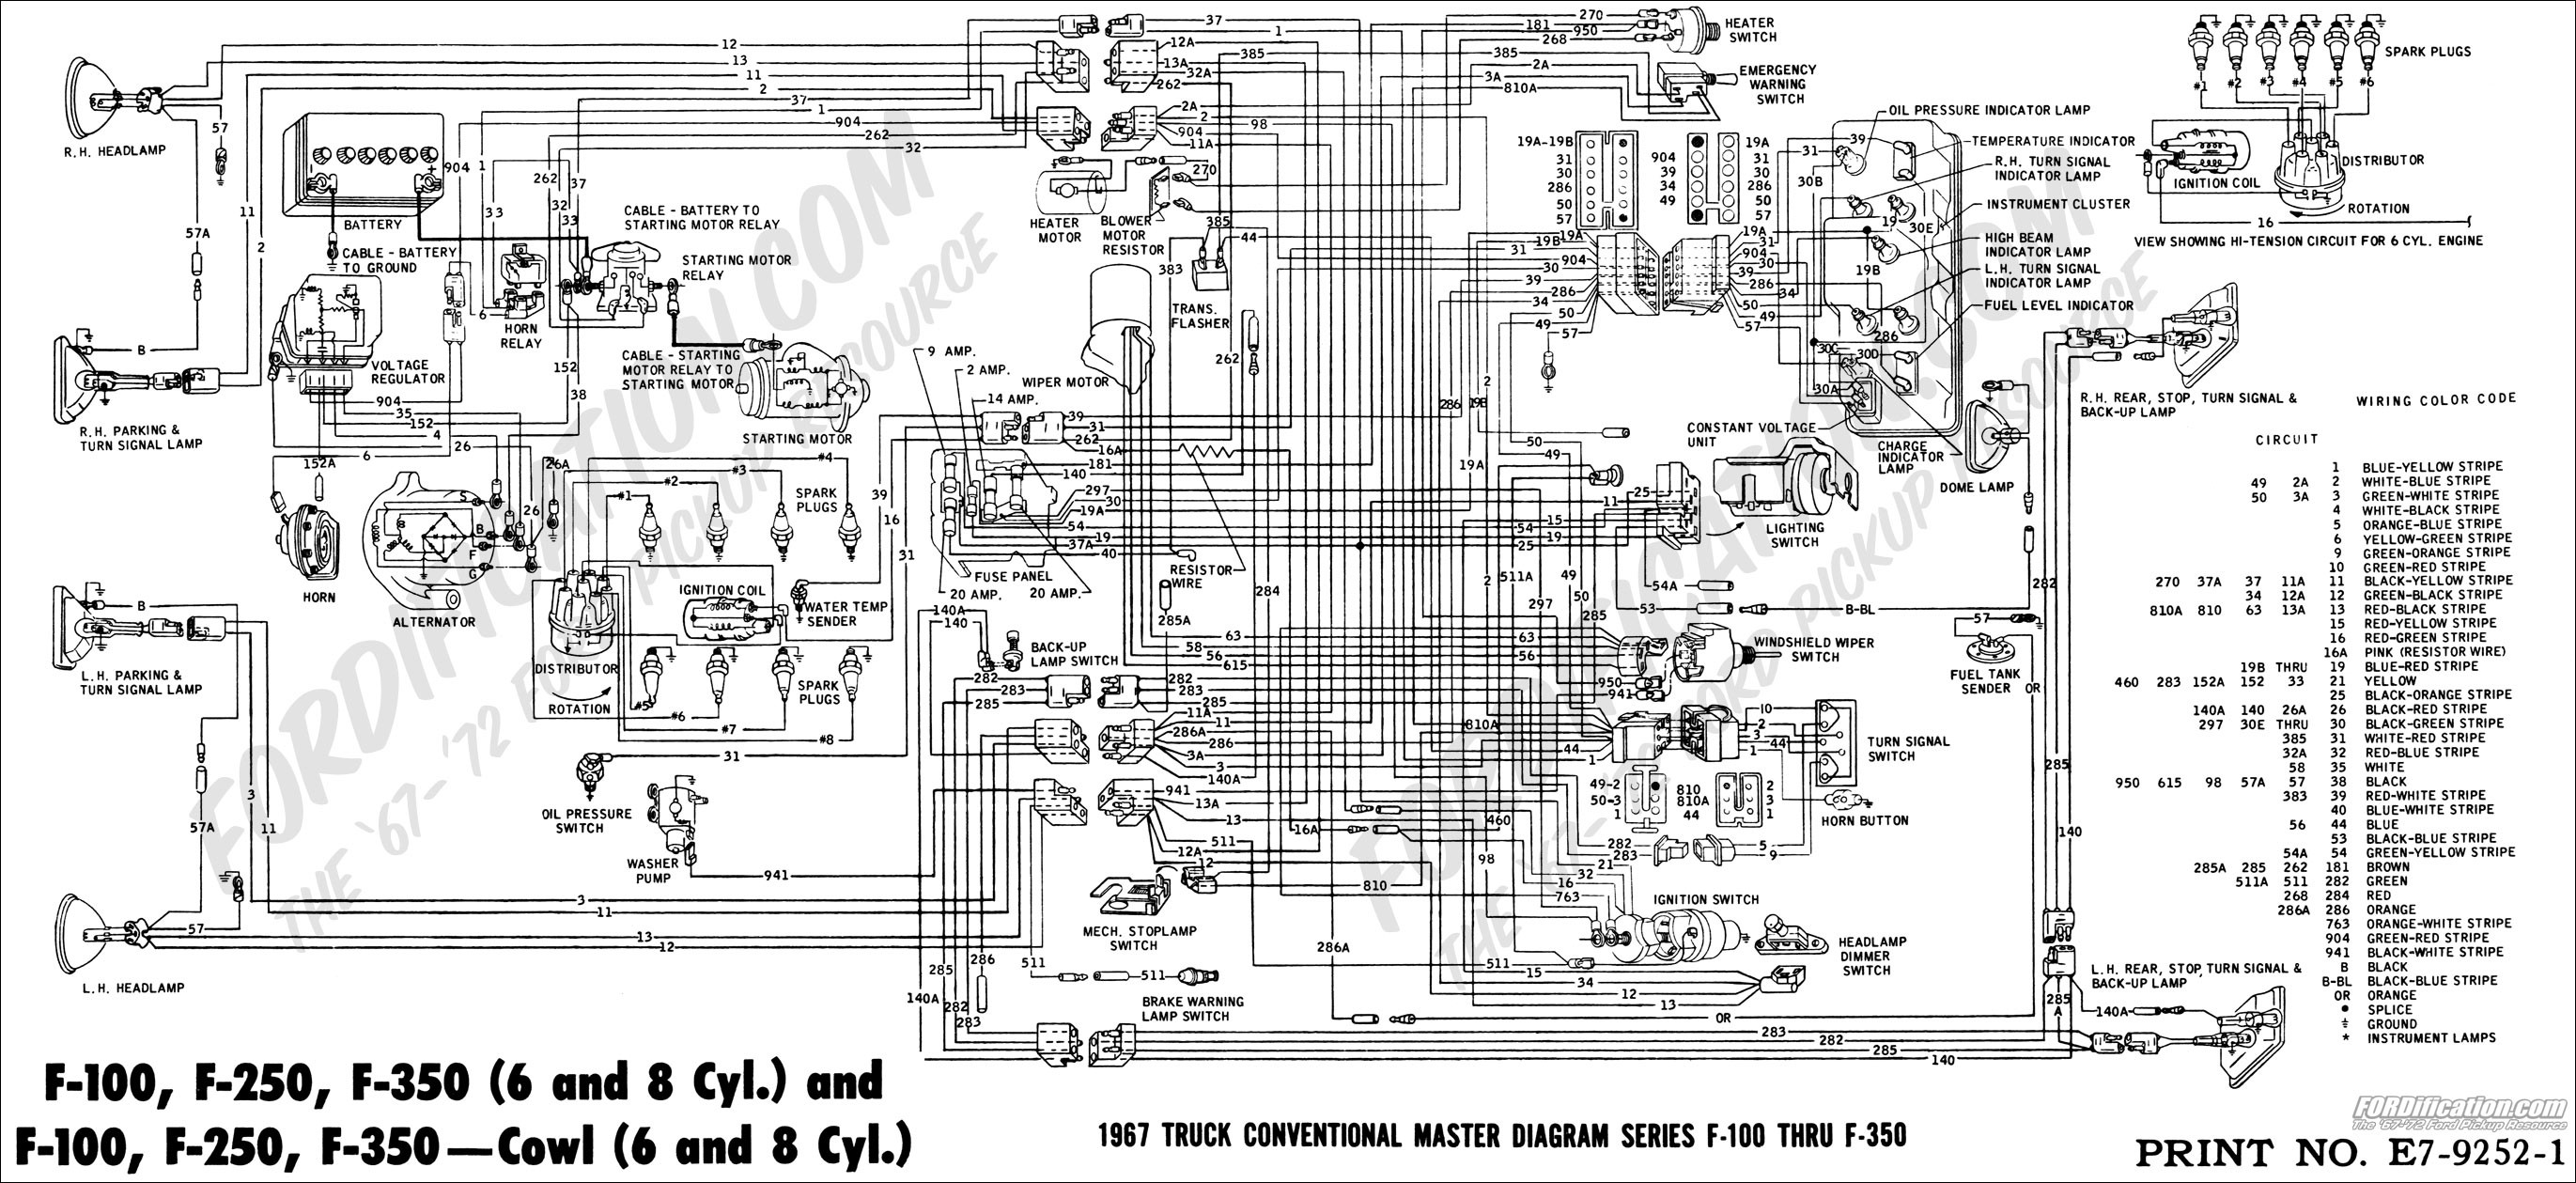 2002 Gsxr 1000 Wiring Diagram Awesome 2006 600 S Simple Suzuki Xs650 Xs B C Thexscafe Ponents Of